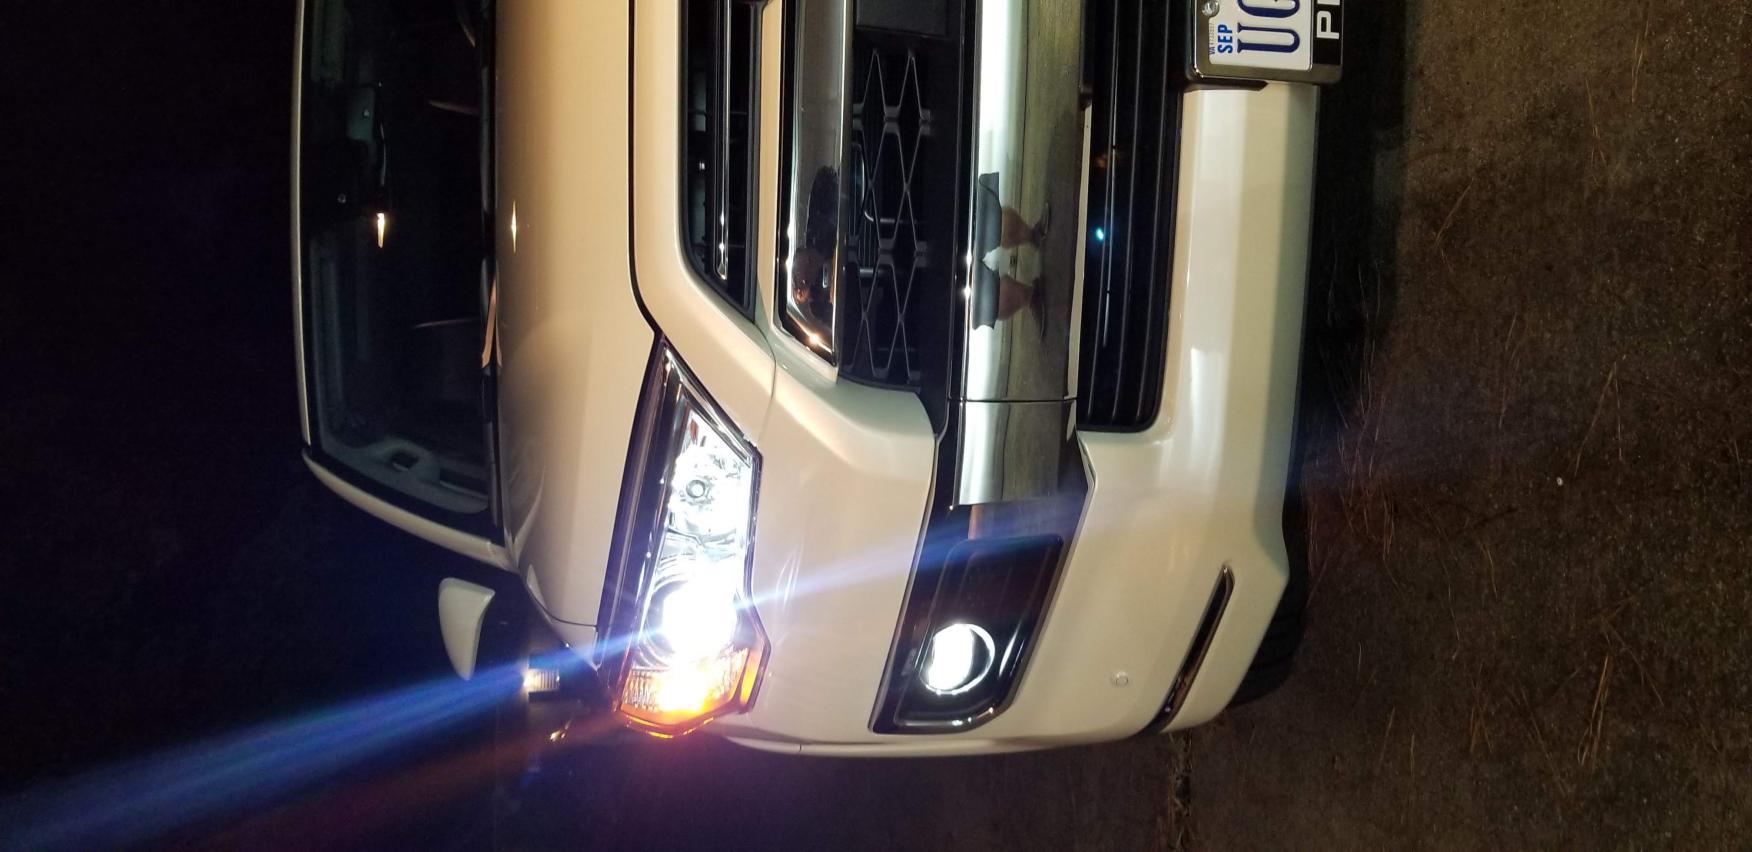 2021 4Runner OEM LED Headlights/Lights Performance and Retrofit-20201014_191728-jpg